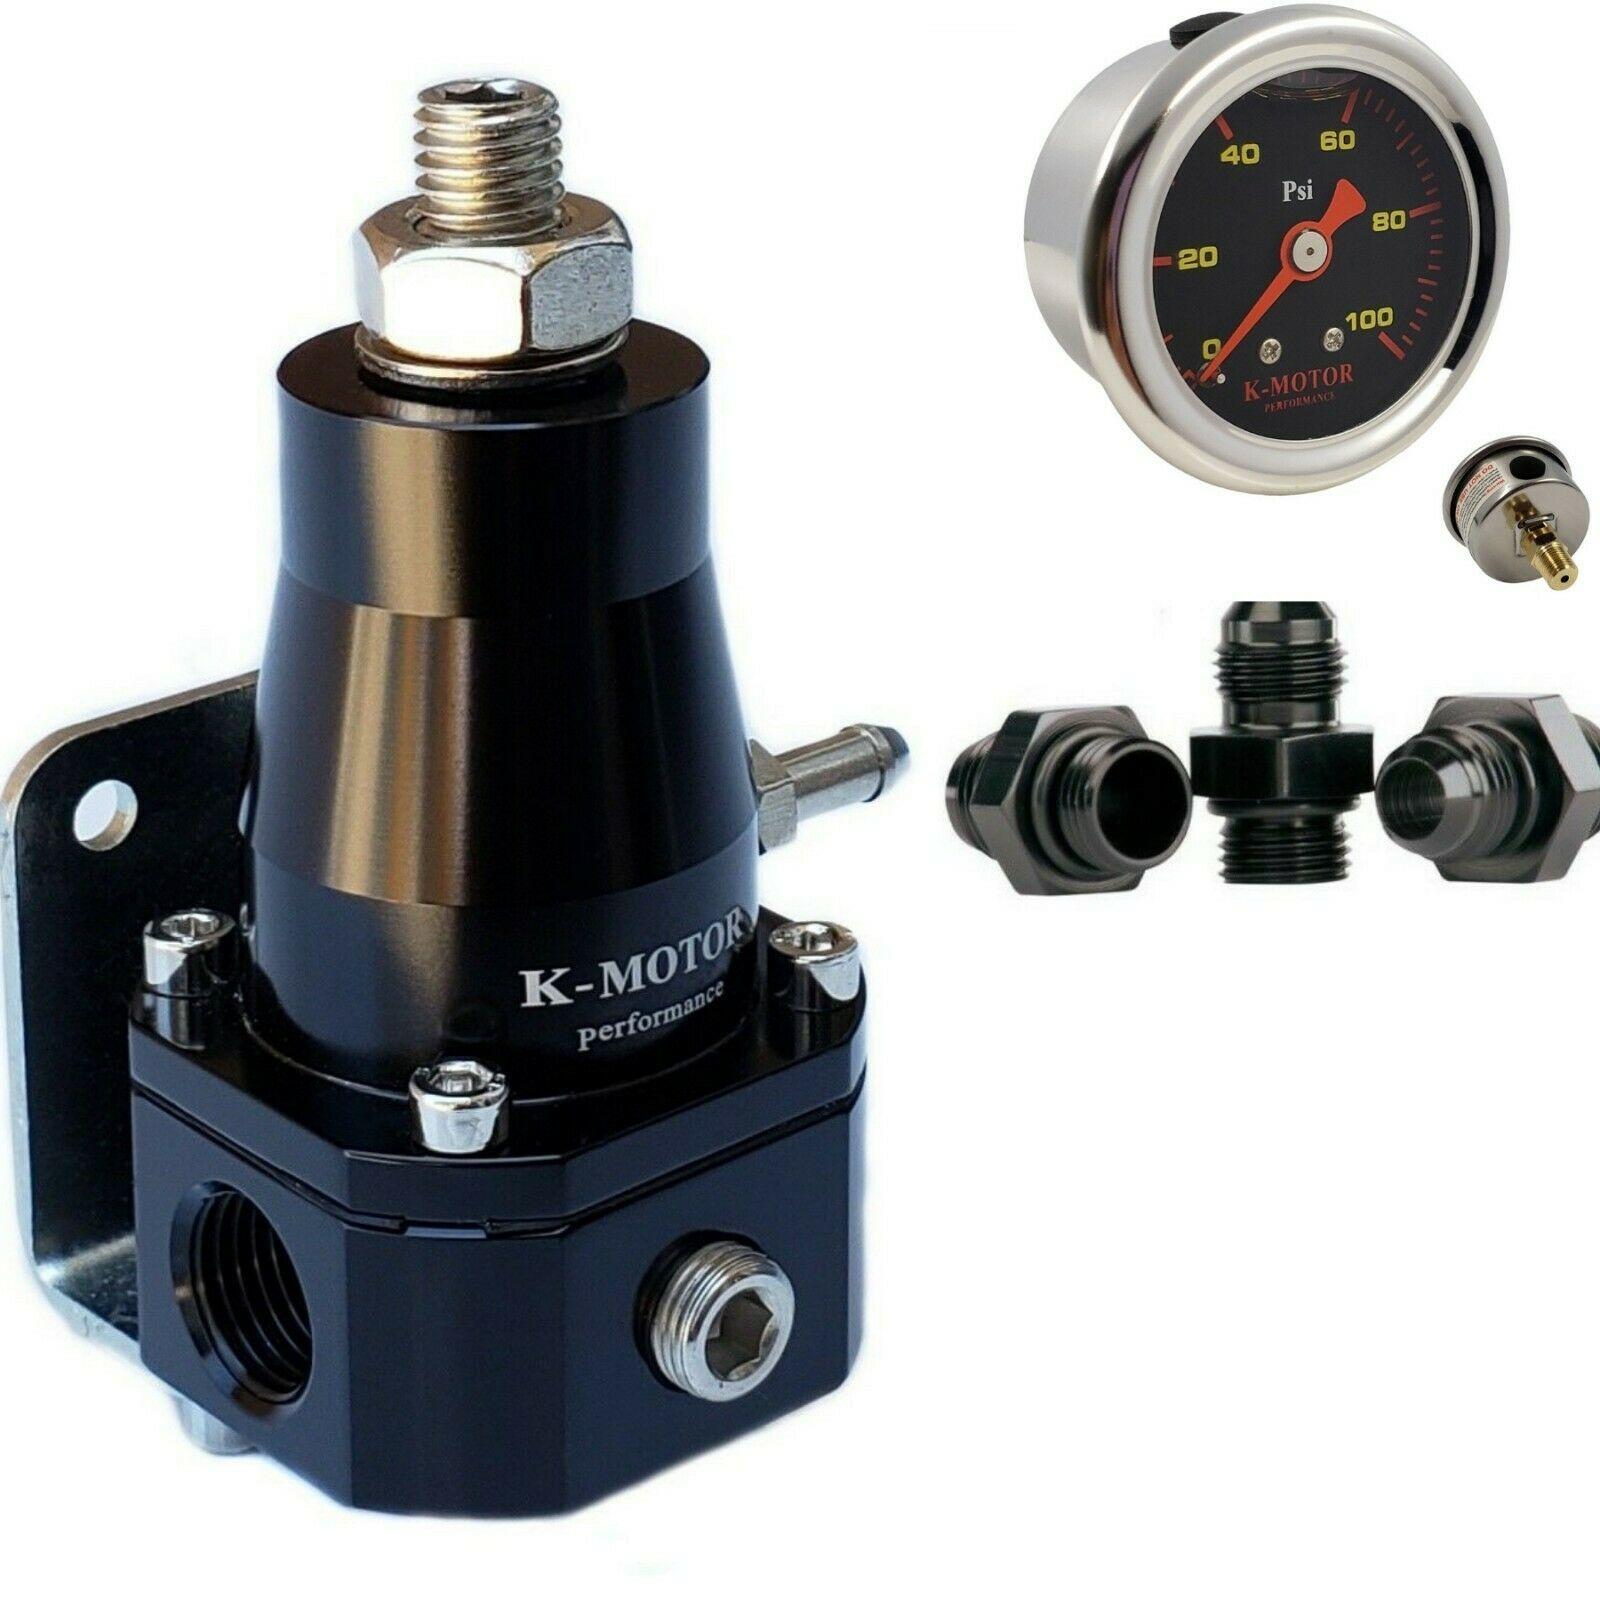 Universal Adjustable EFI Aluminum Fuel Pressure Regulator Kit with 0-100 psi Gauge AN6-6AN Fuel Line Hose Fittings Black